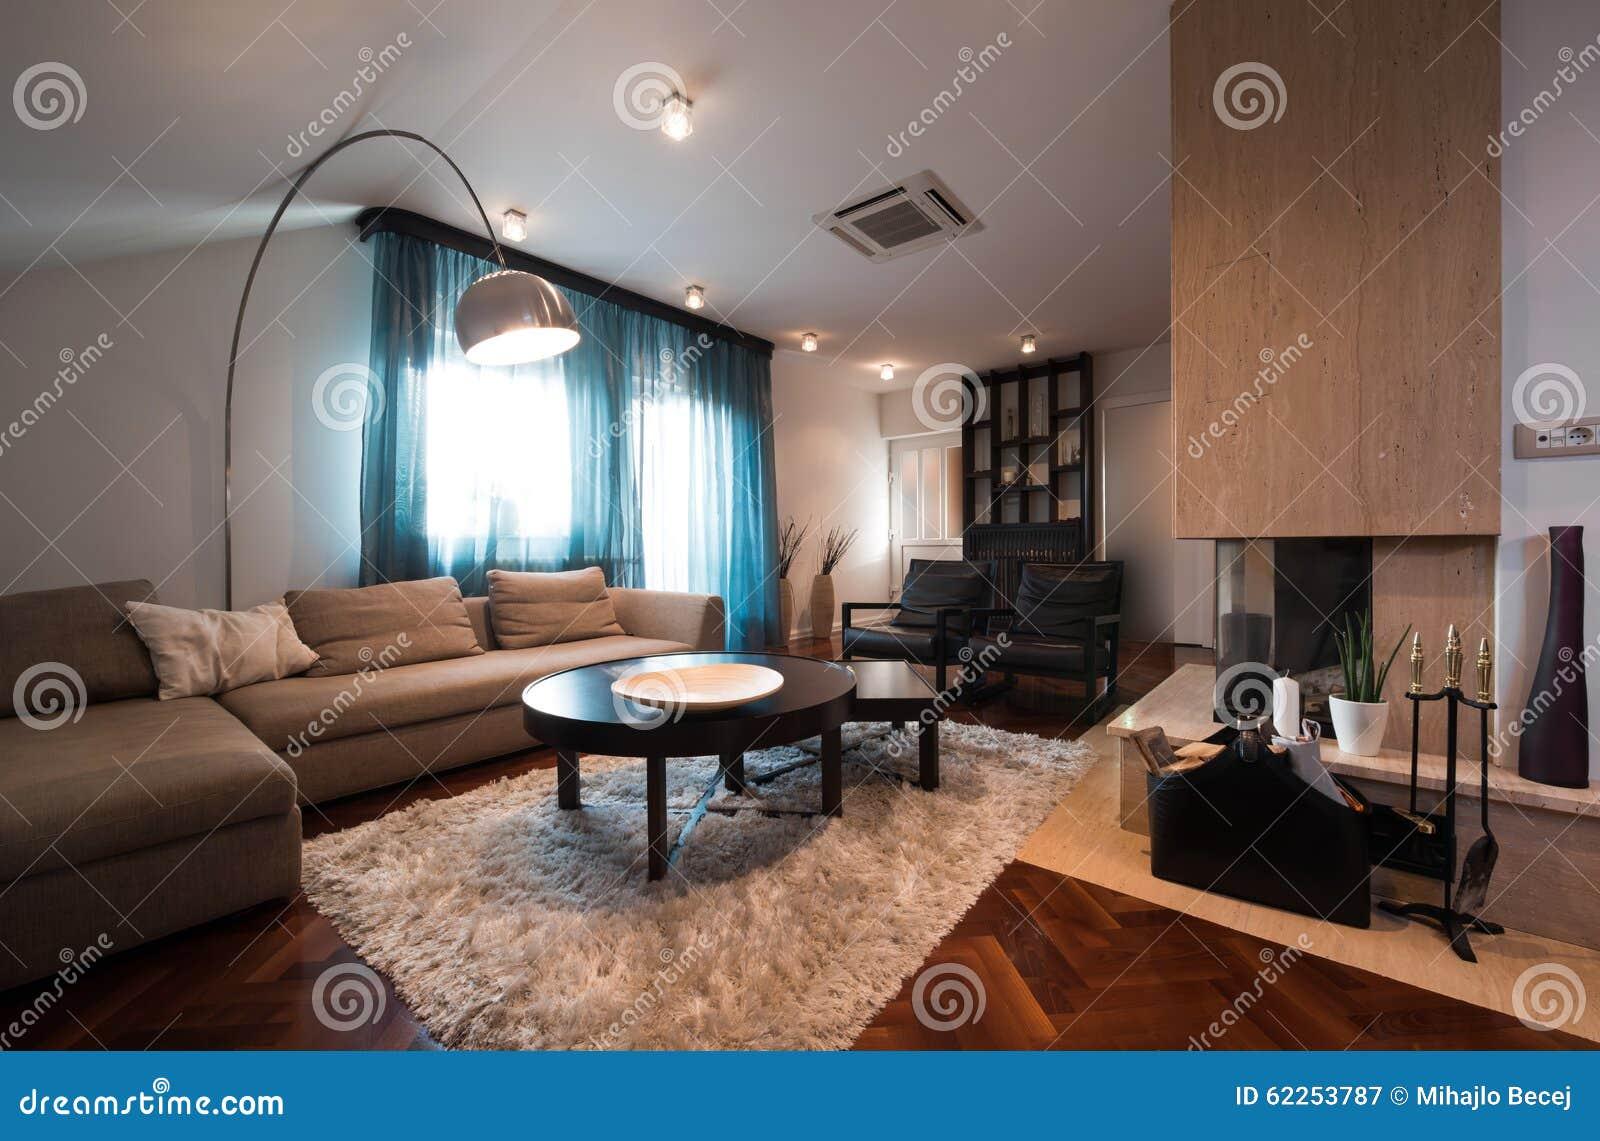 Super Dachbodeninnenraum Mit Kamin Mitten In Dem Raum Stockbild - Bild VQ15